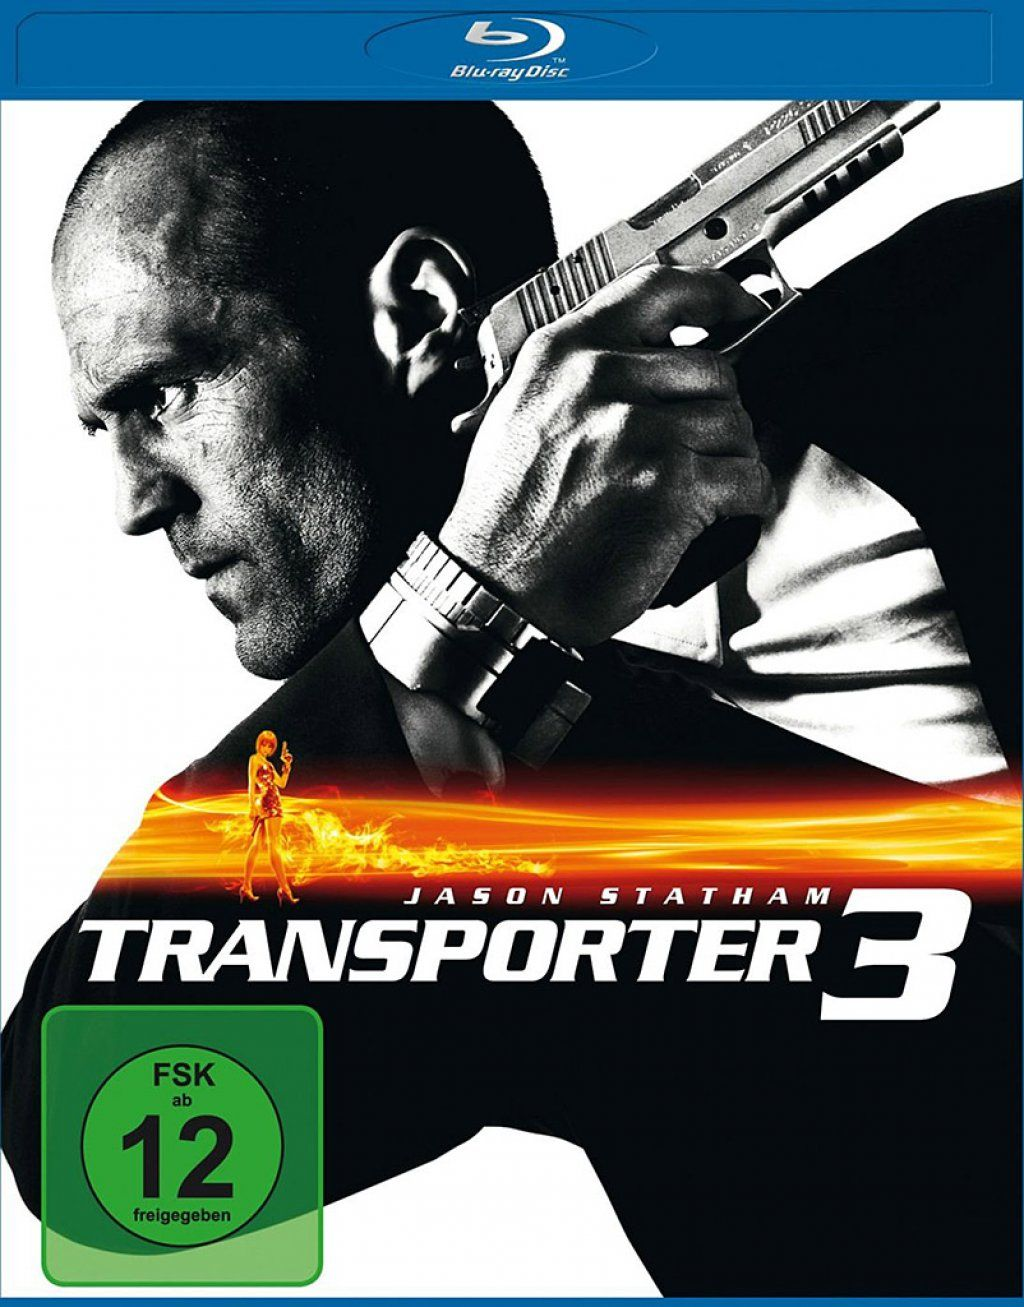 Transporter 3 (BLURAY)